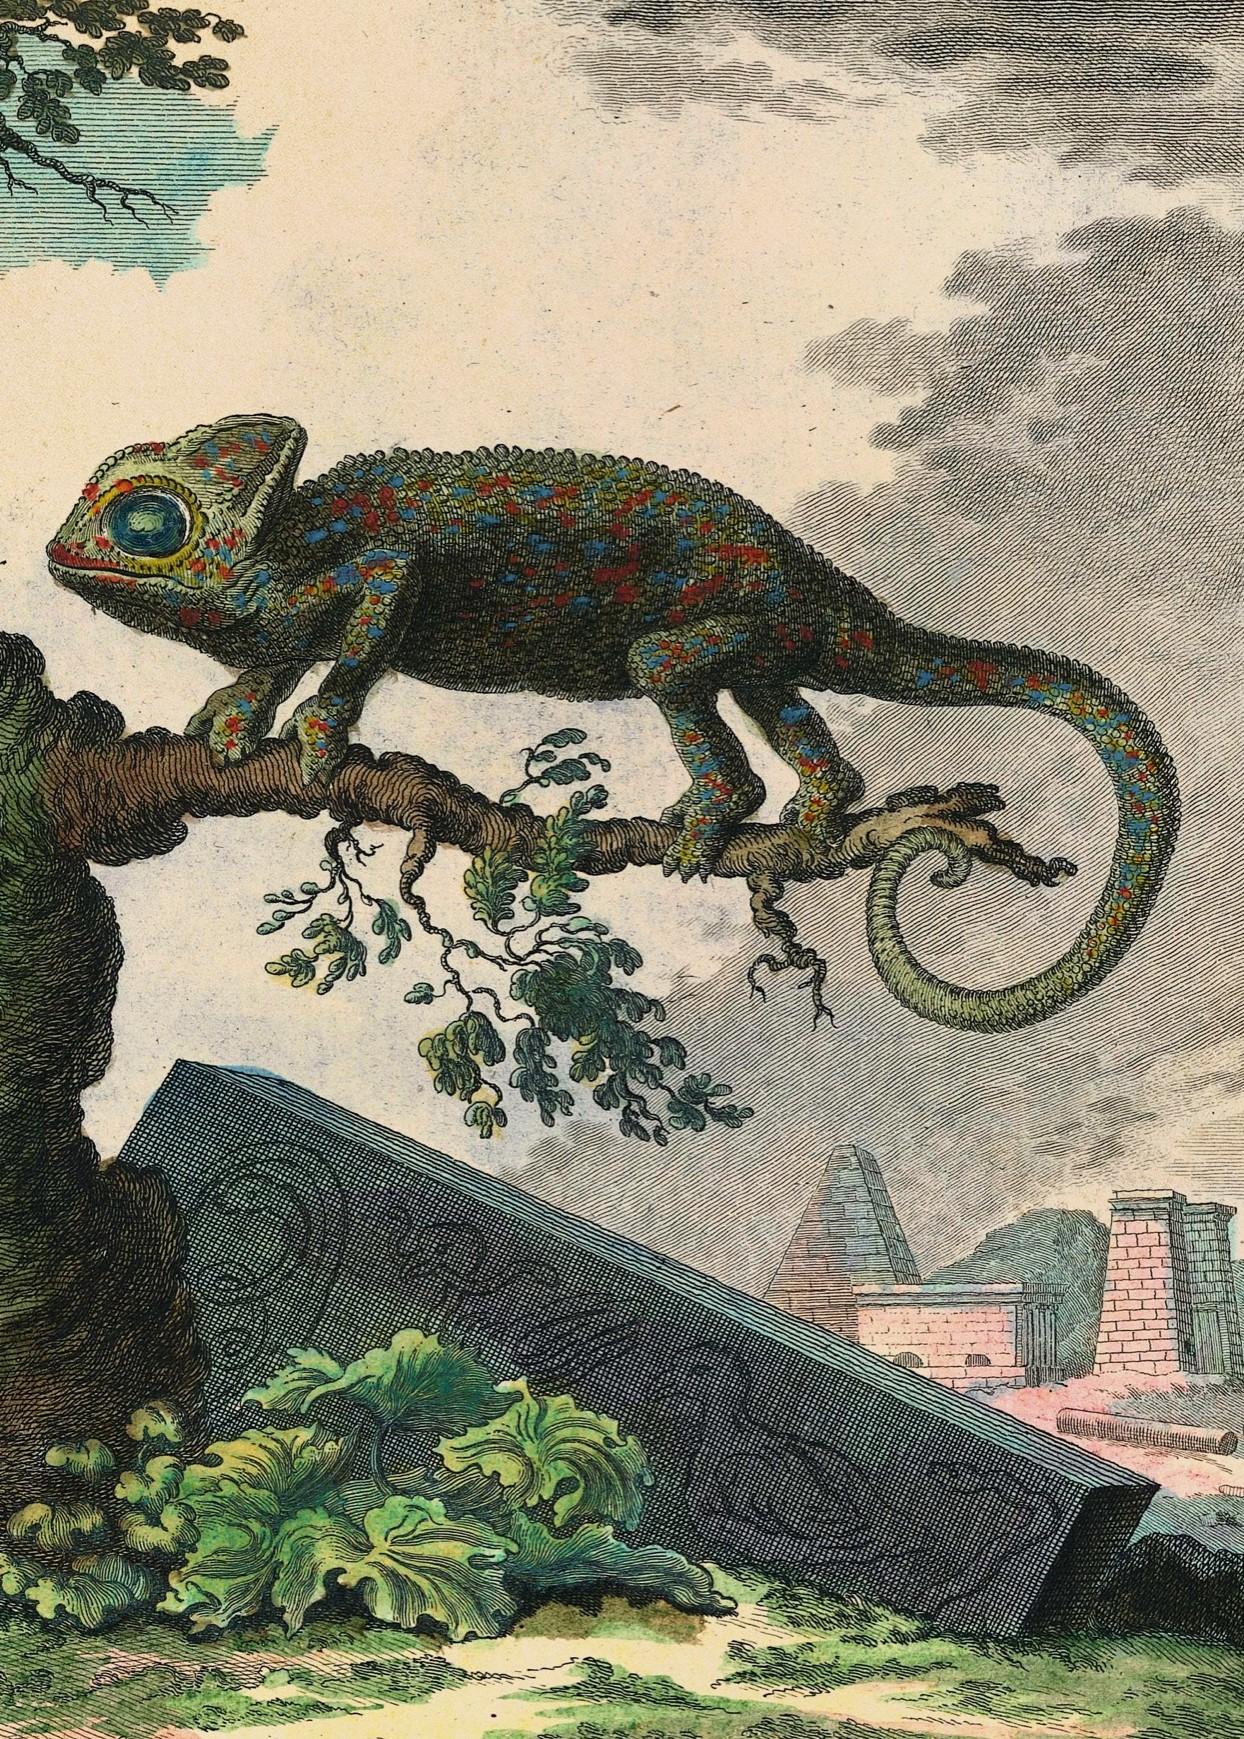 'Histoire Naturelle', Comte de Buffon